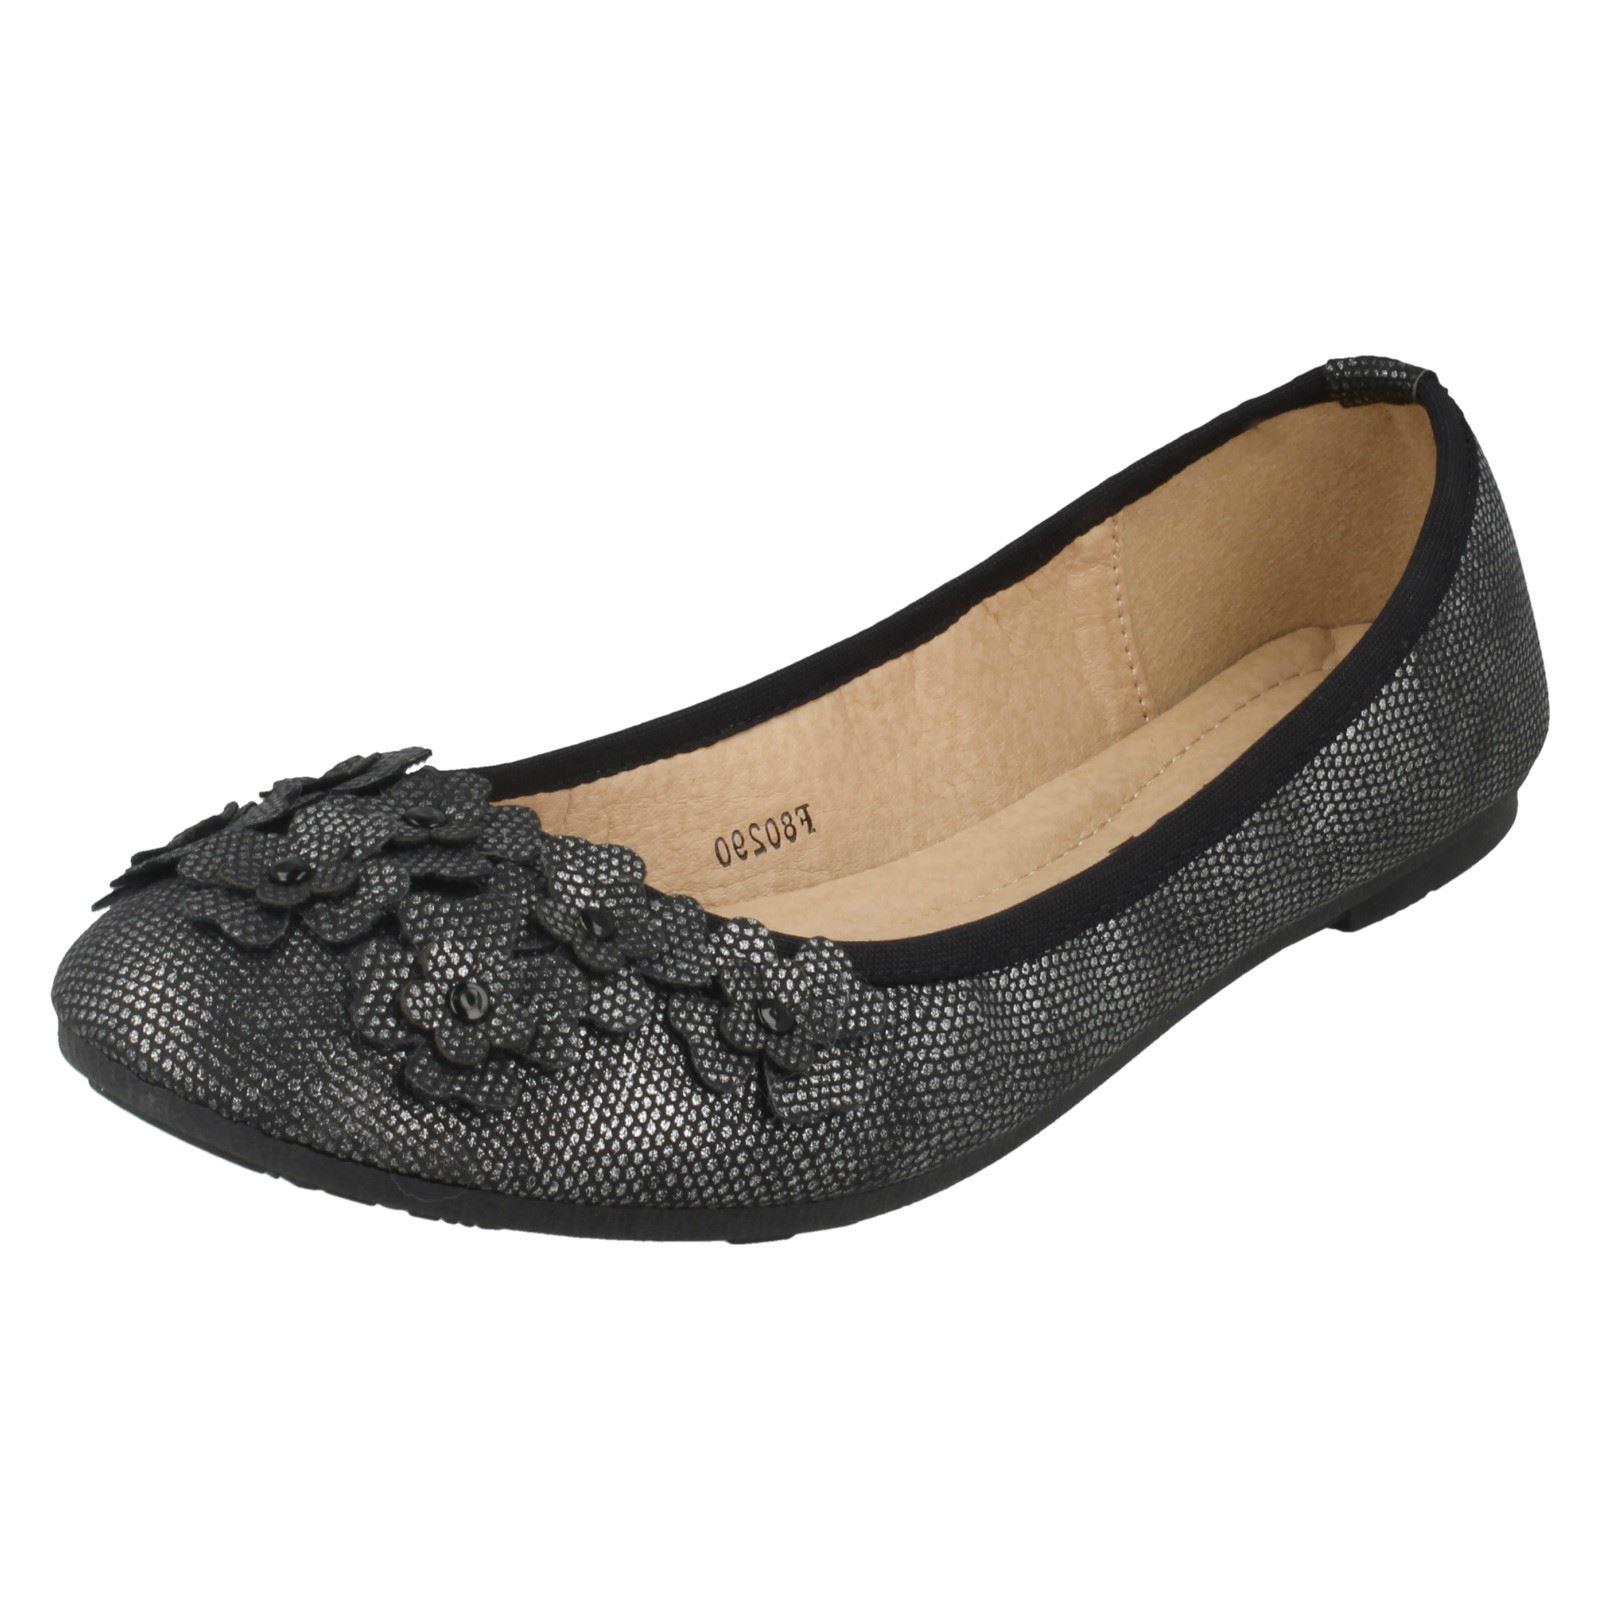 Damas Spot On Sintético Slip on Bailarina Zapatos